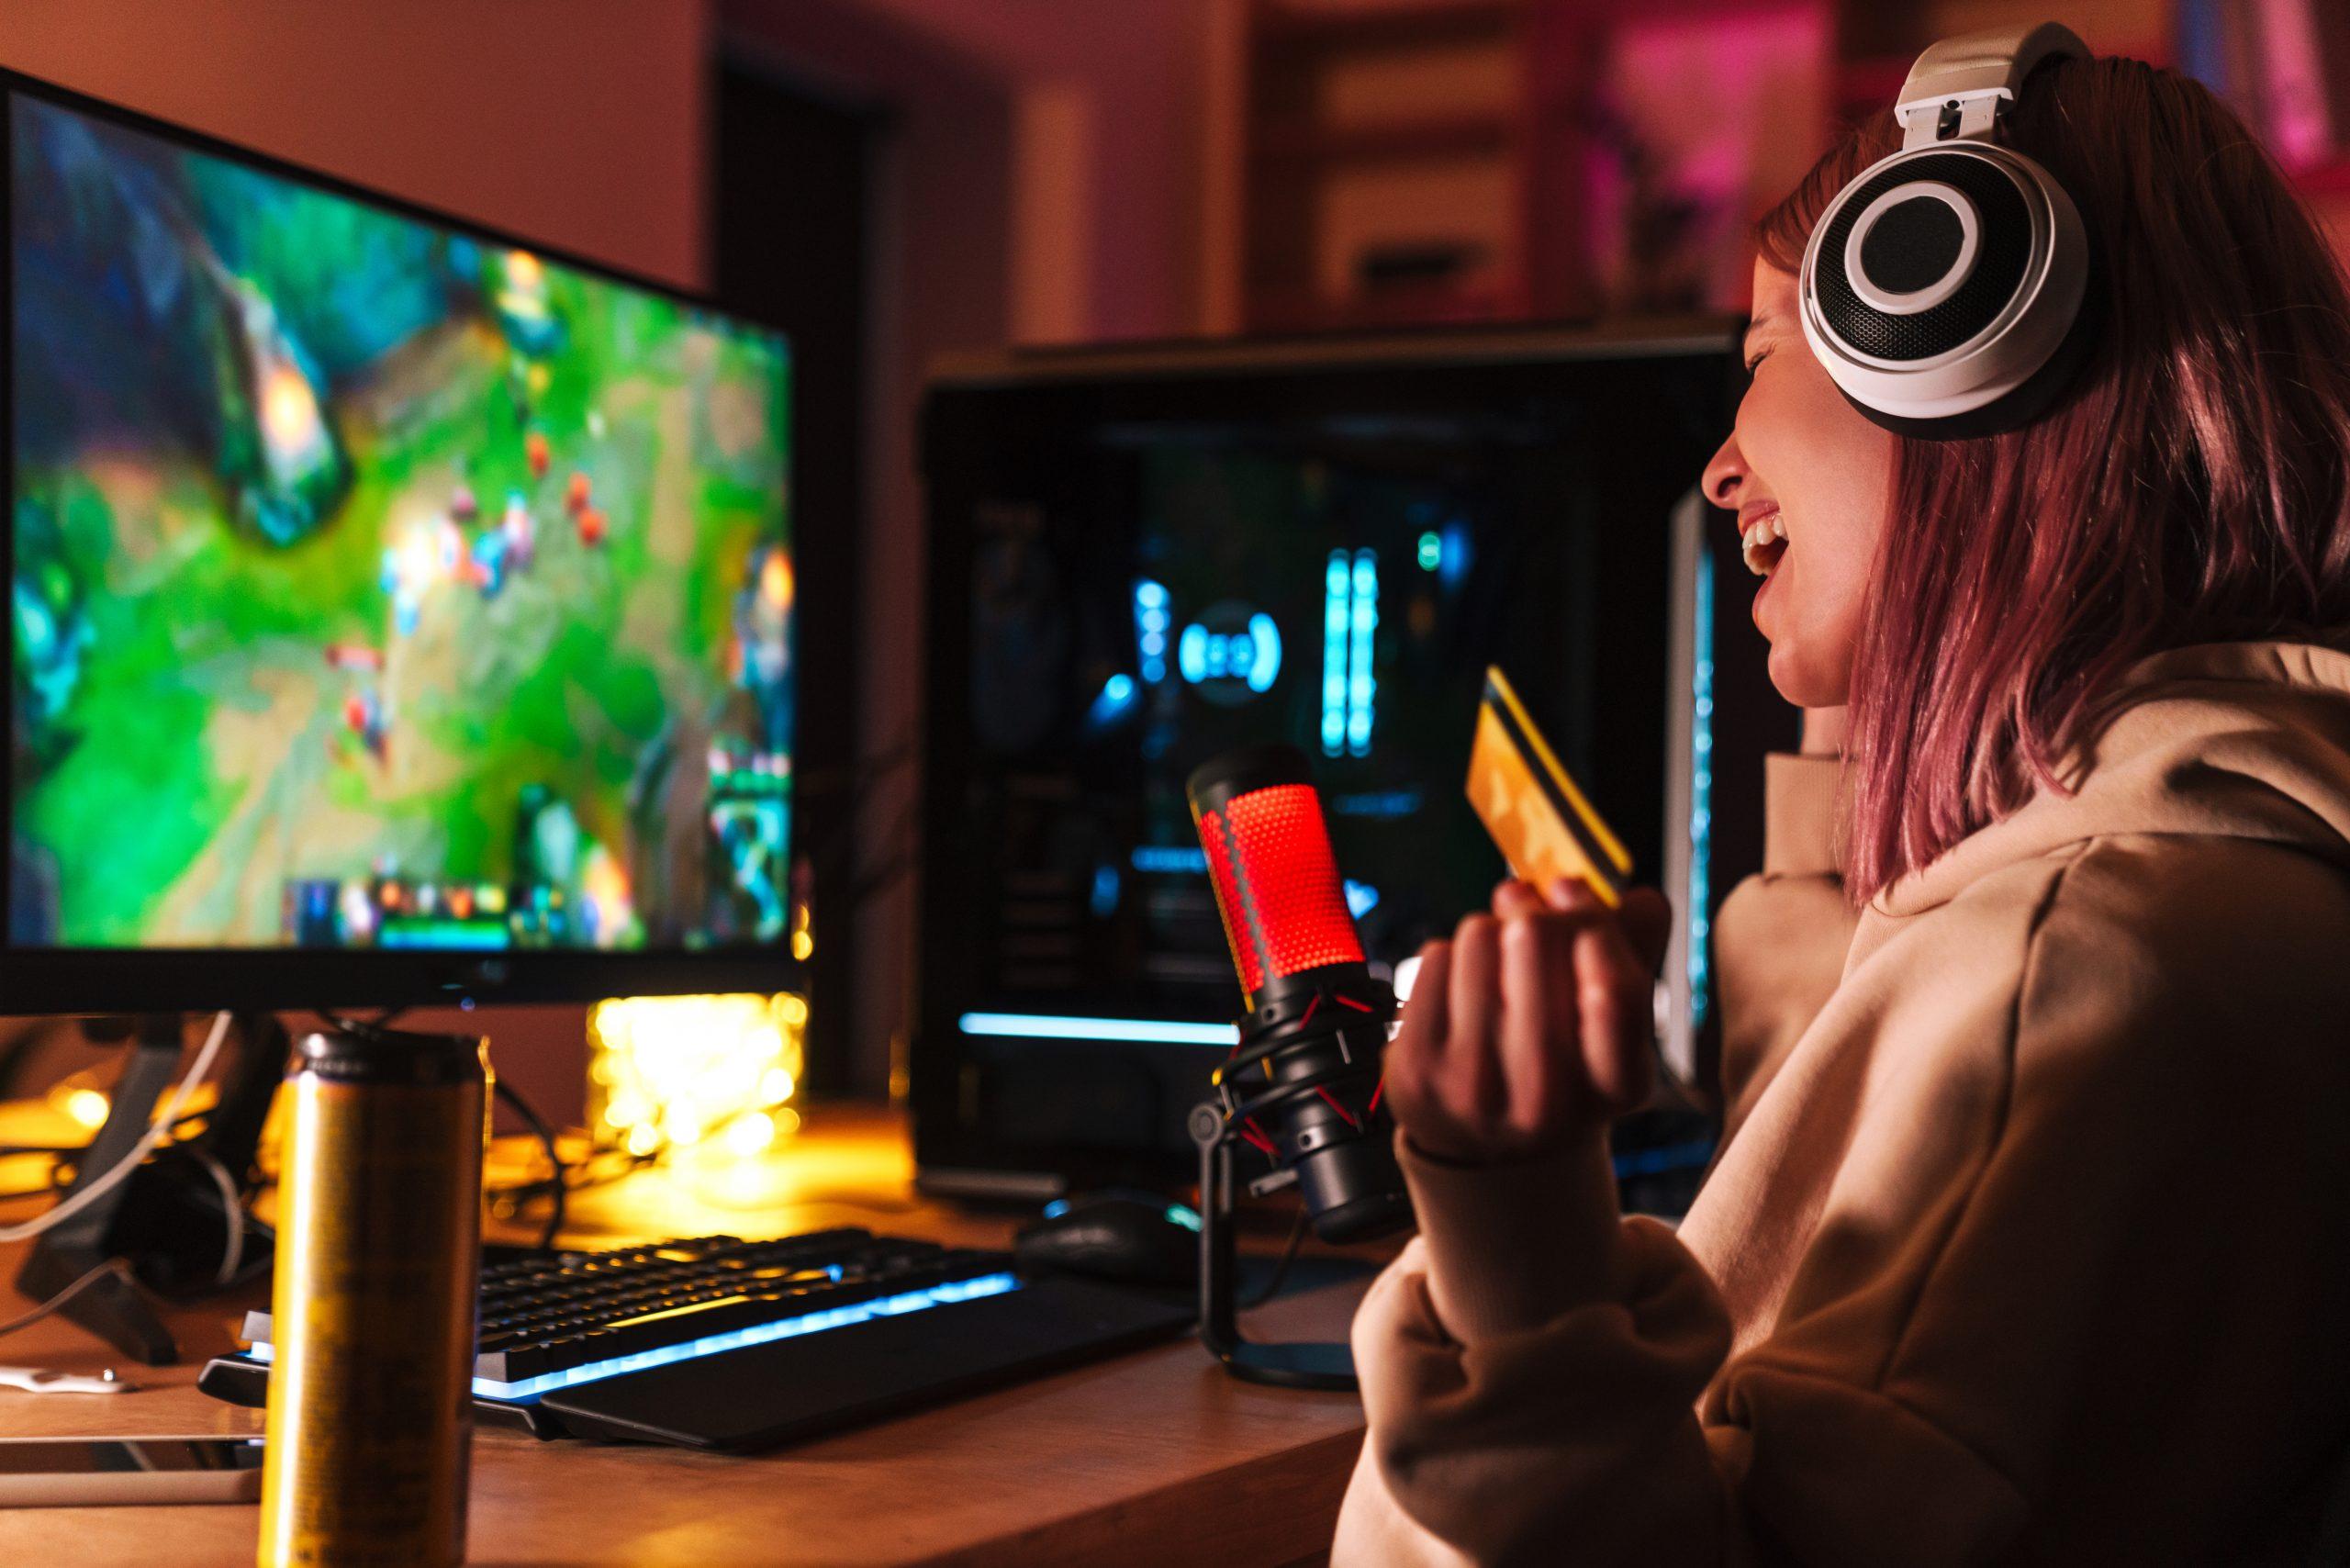 Top 10 Virtual Happy Hour Games